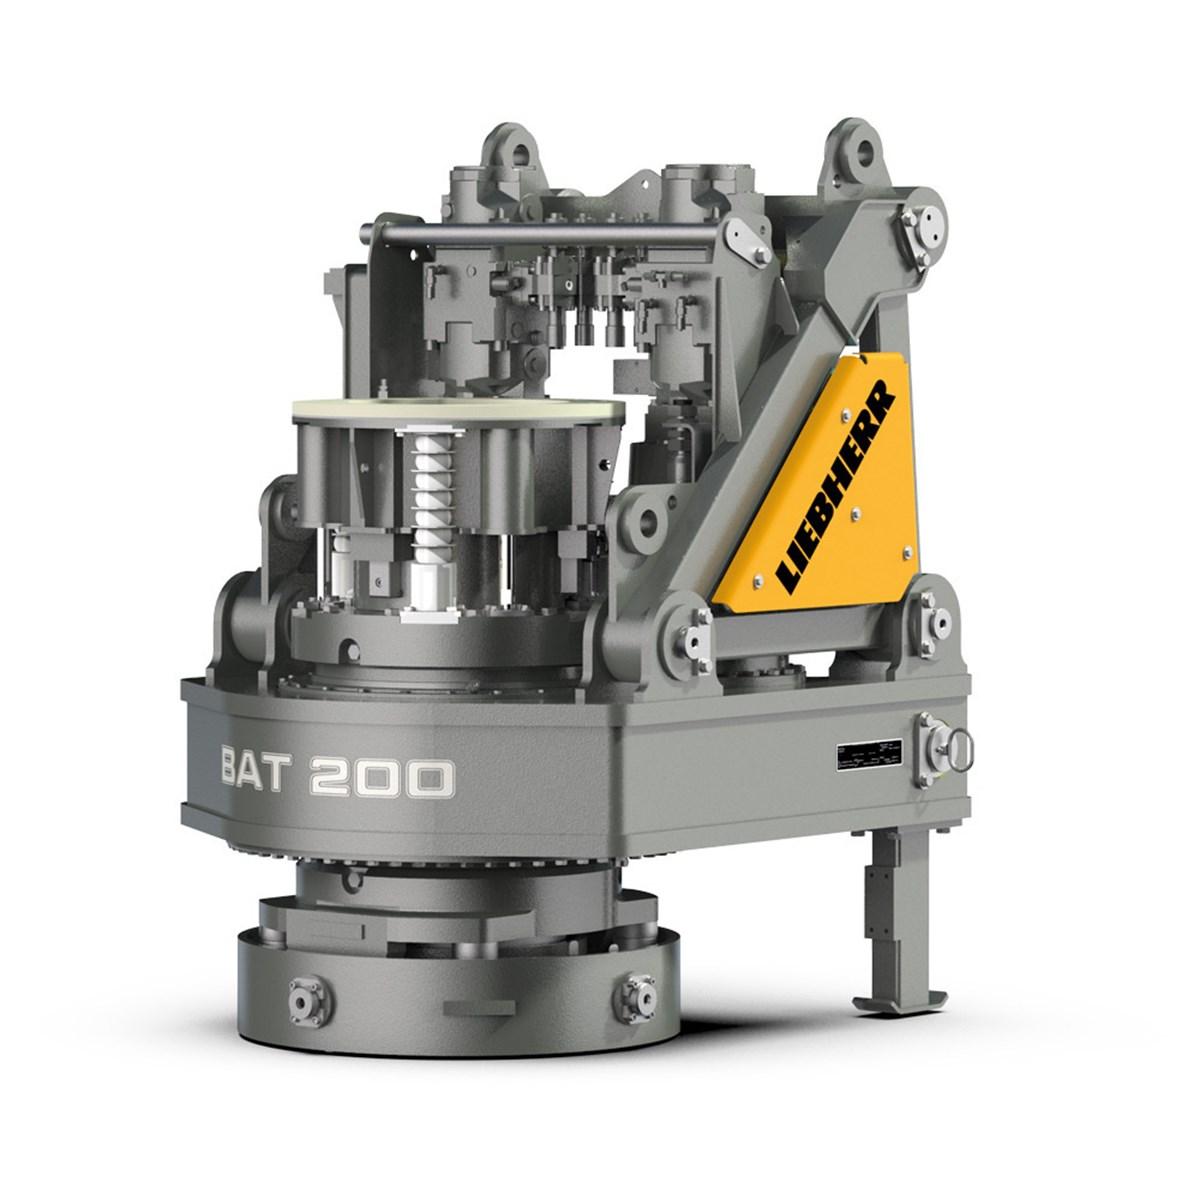 liebherr-bat-200-rotary-drive-bohrantrieb-for-lb-20-drilling-rig-deep-founda.jpg